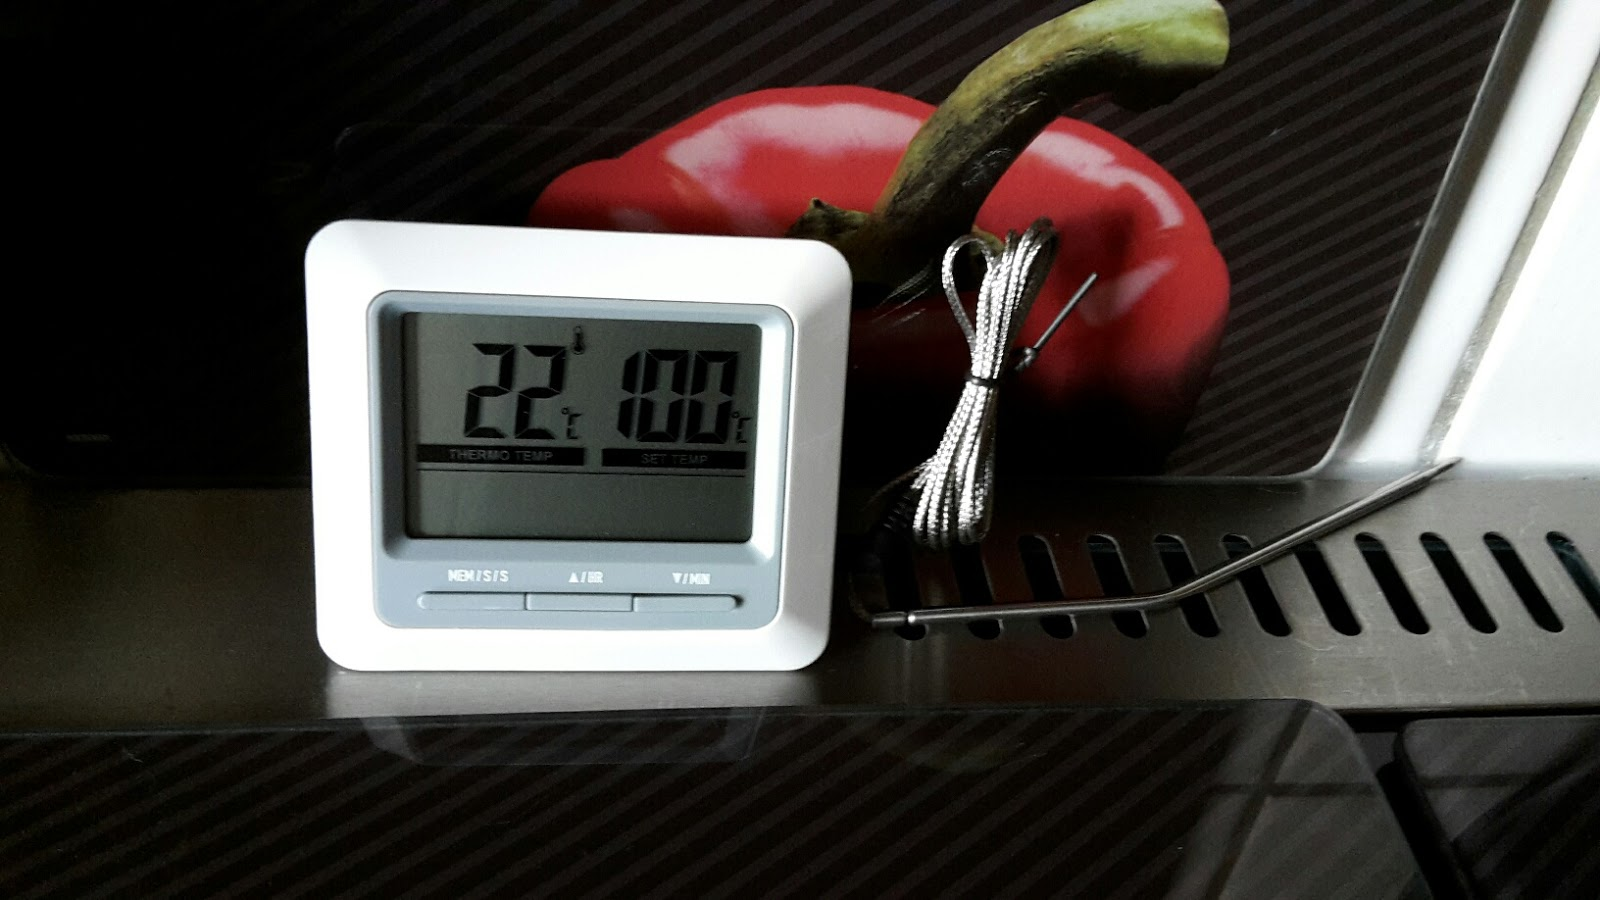 mona 39 s blog topop barbecue grill thermometer und digital. Black Bedroom Furniture Sets. Home Design Ideas